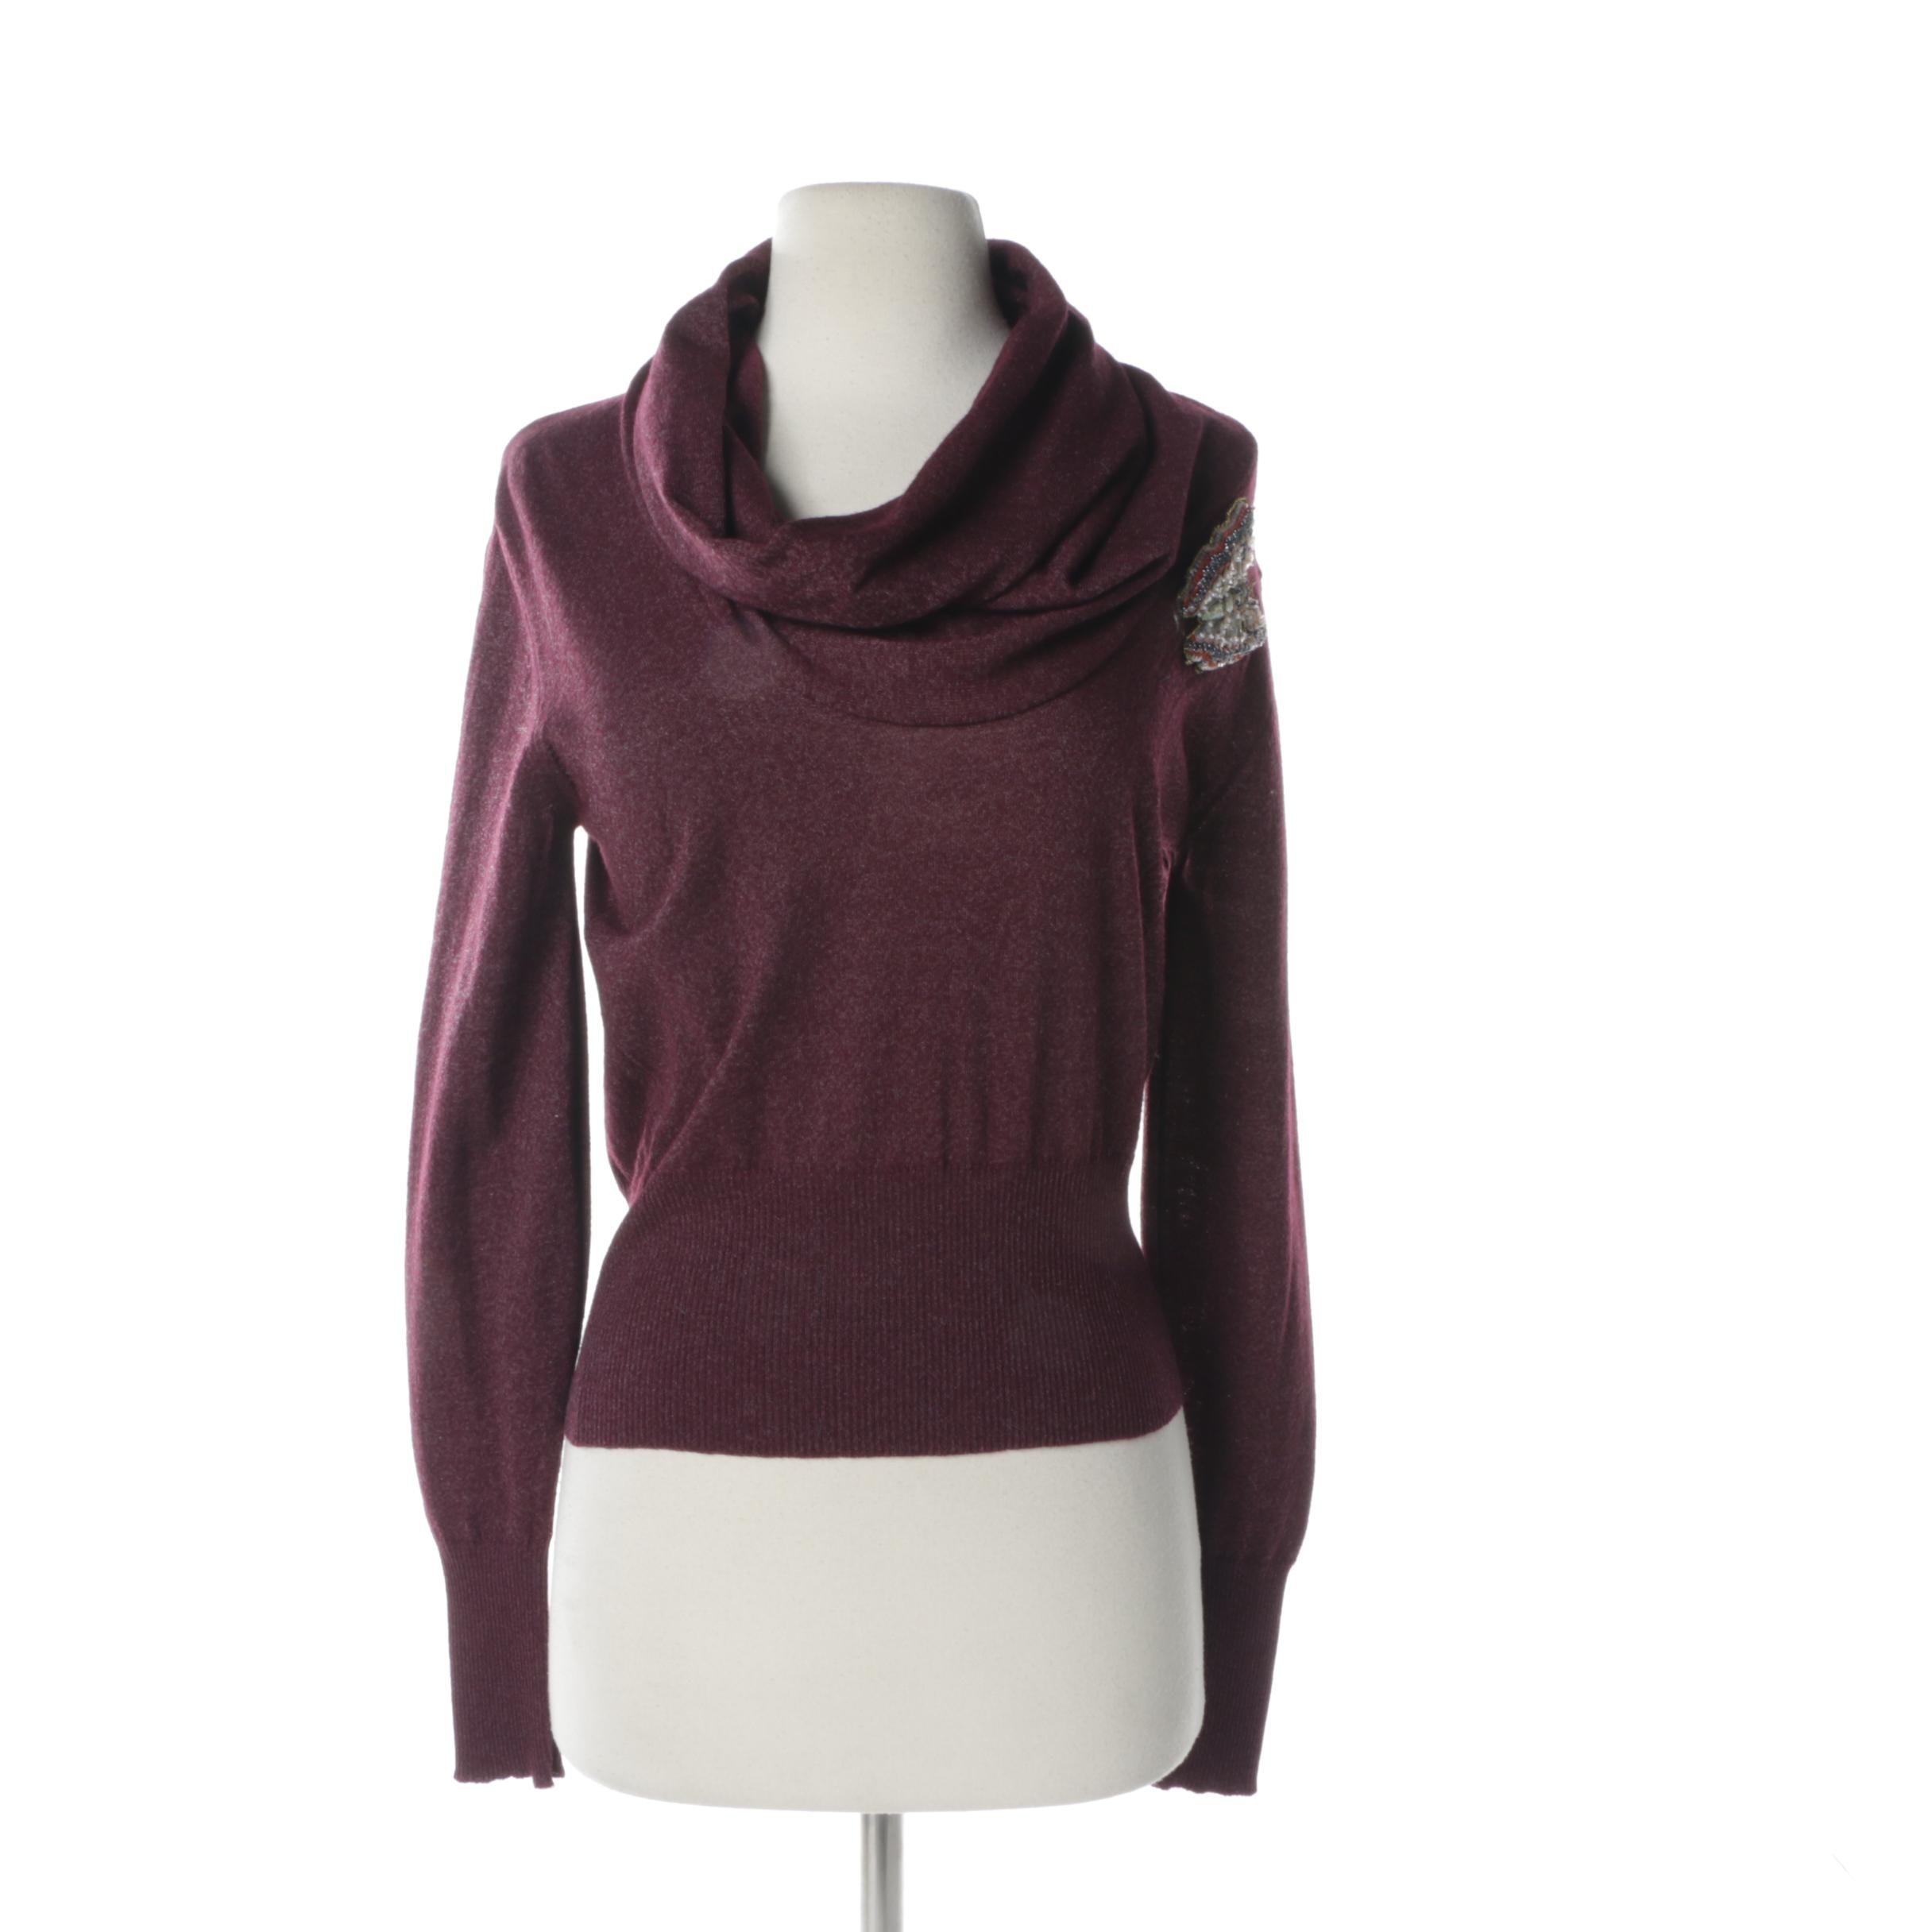 Women's Chloé Cowl Neck Wool Blend Sweater